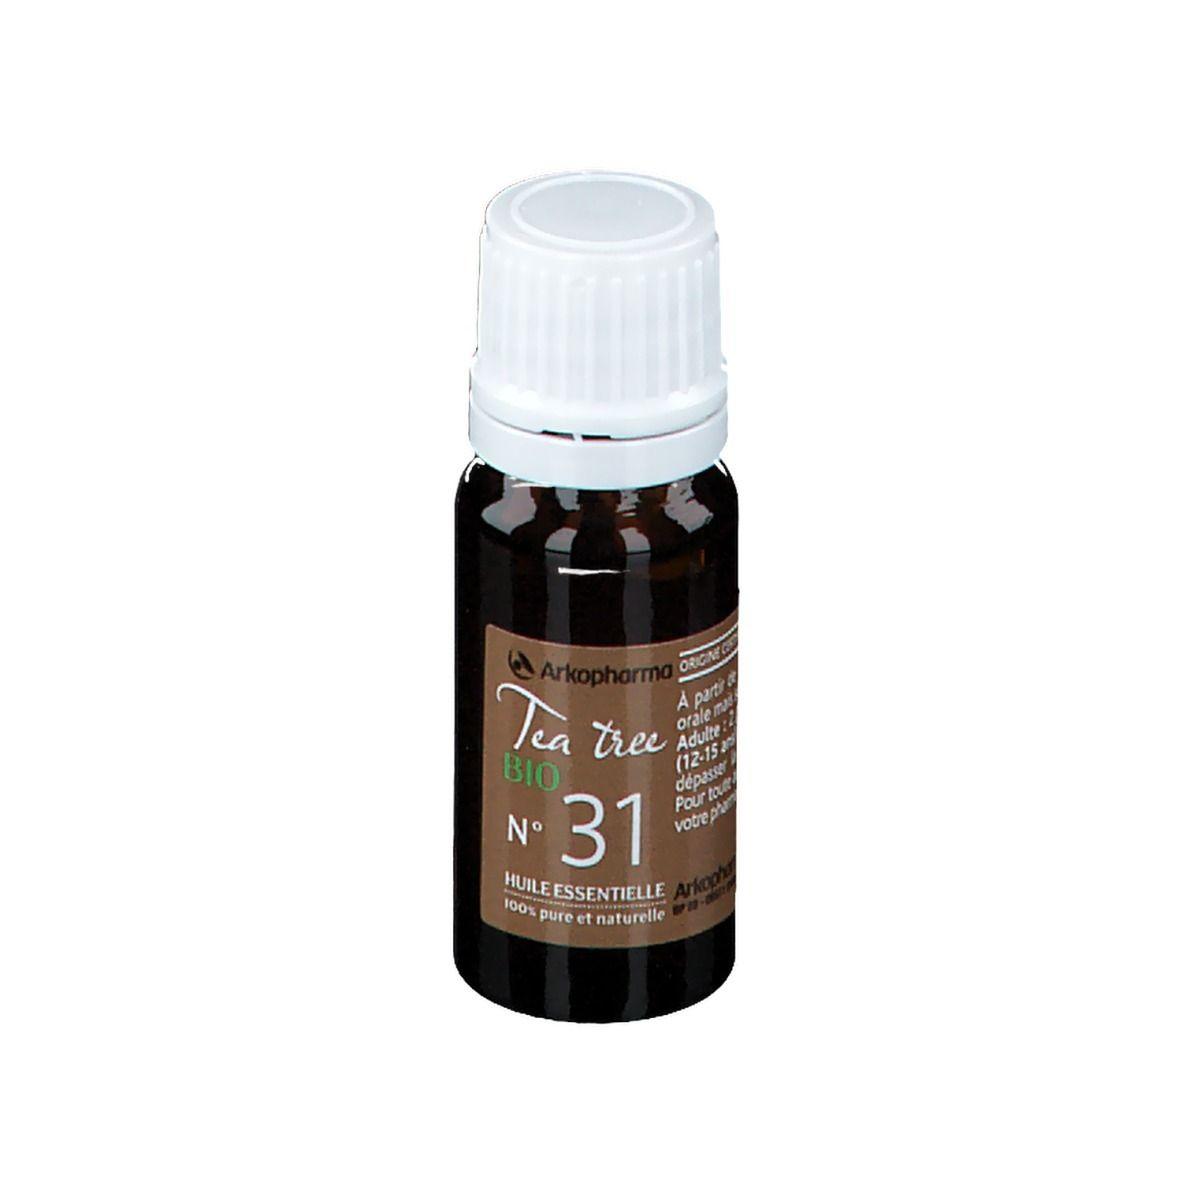 Arkopharma Huile essentielle de Tea tree (Arbre à thé) BIO ml goutte(s)